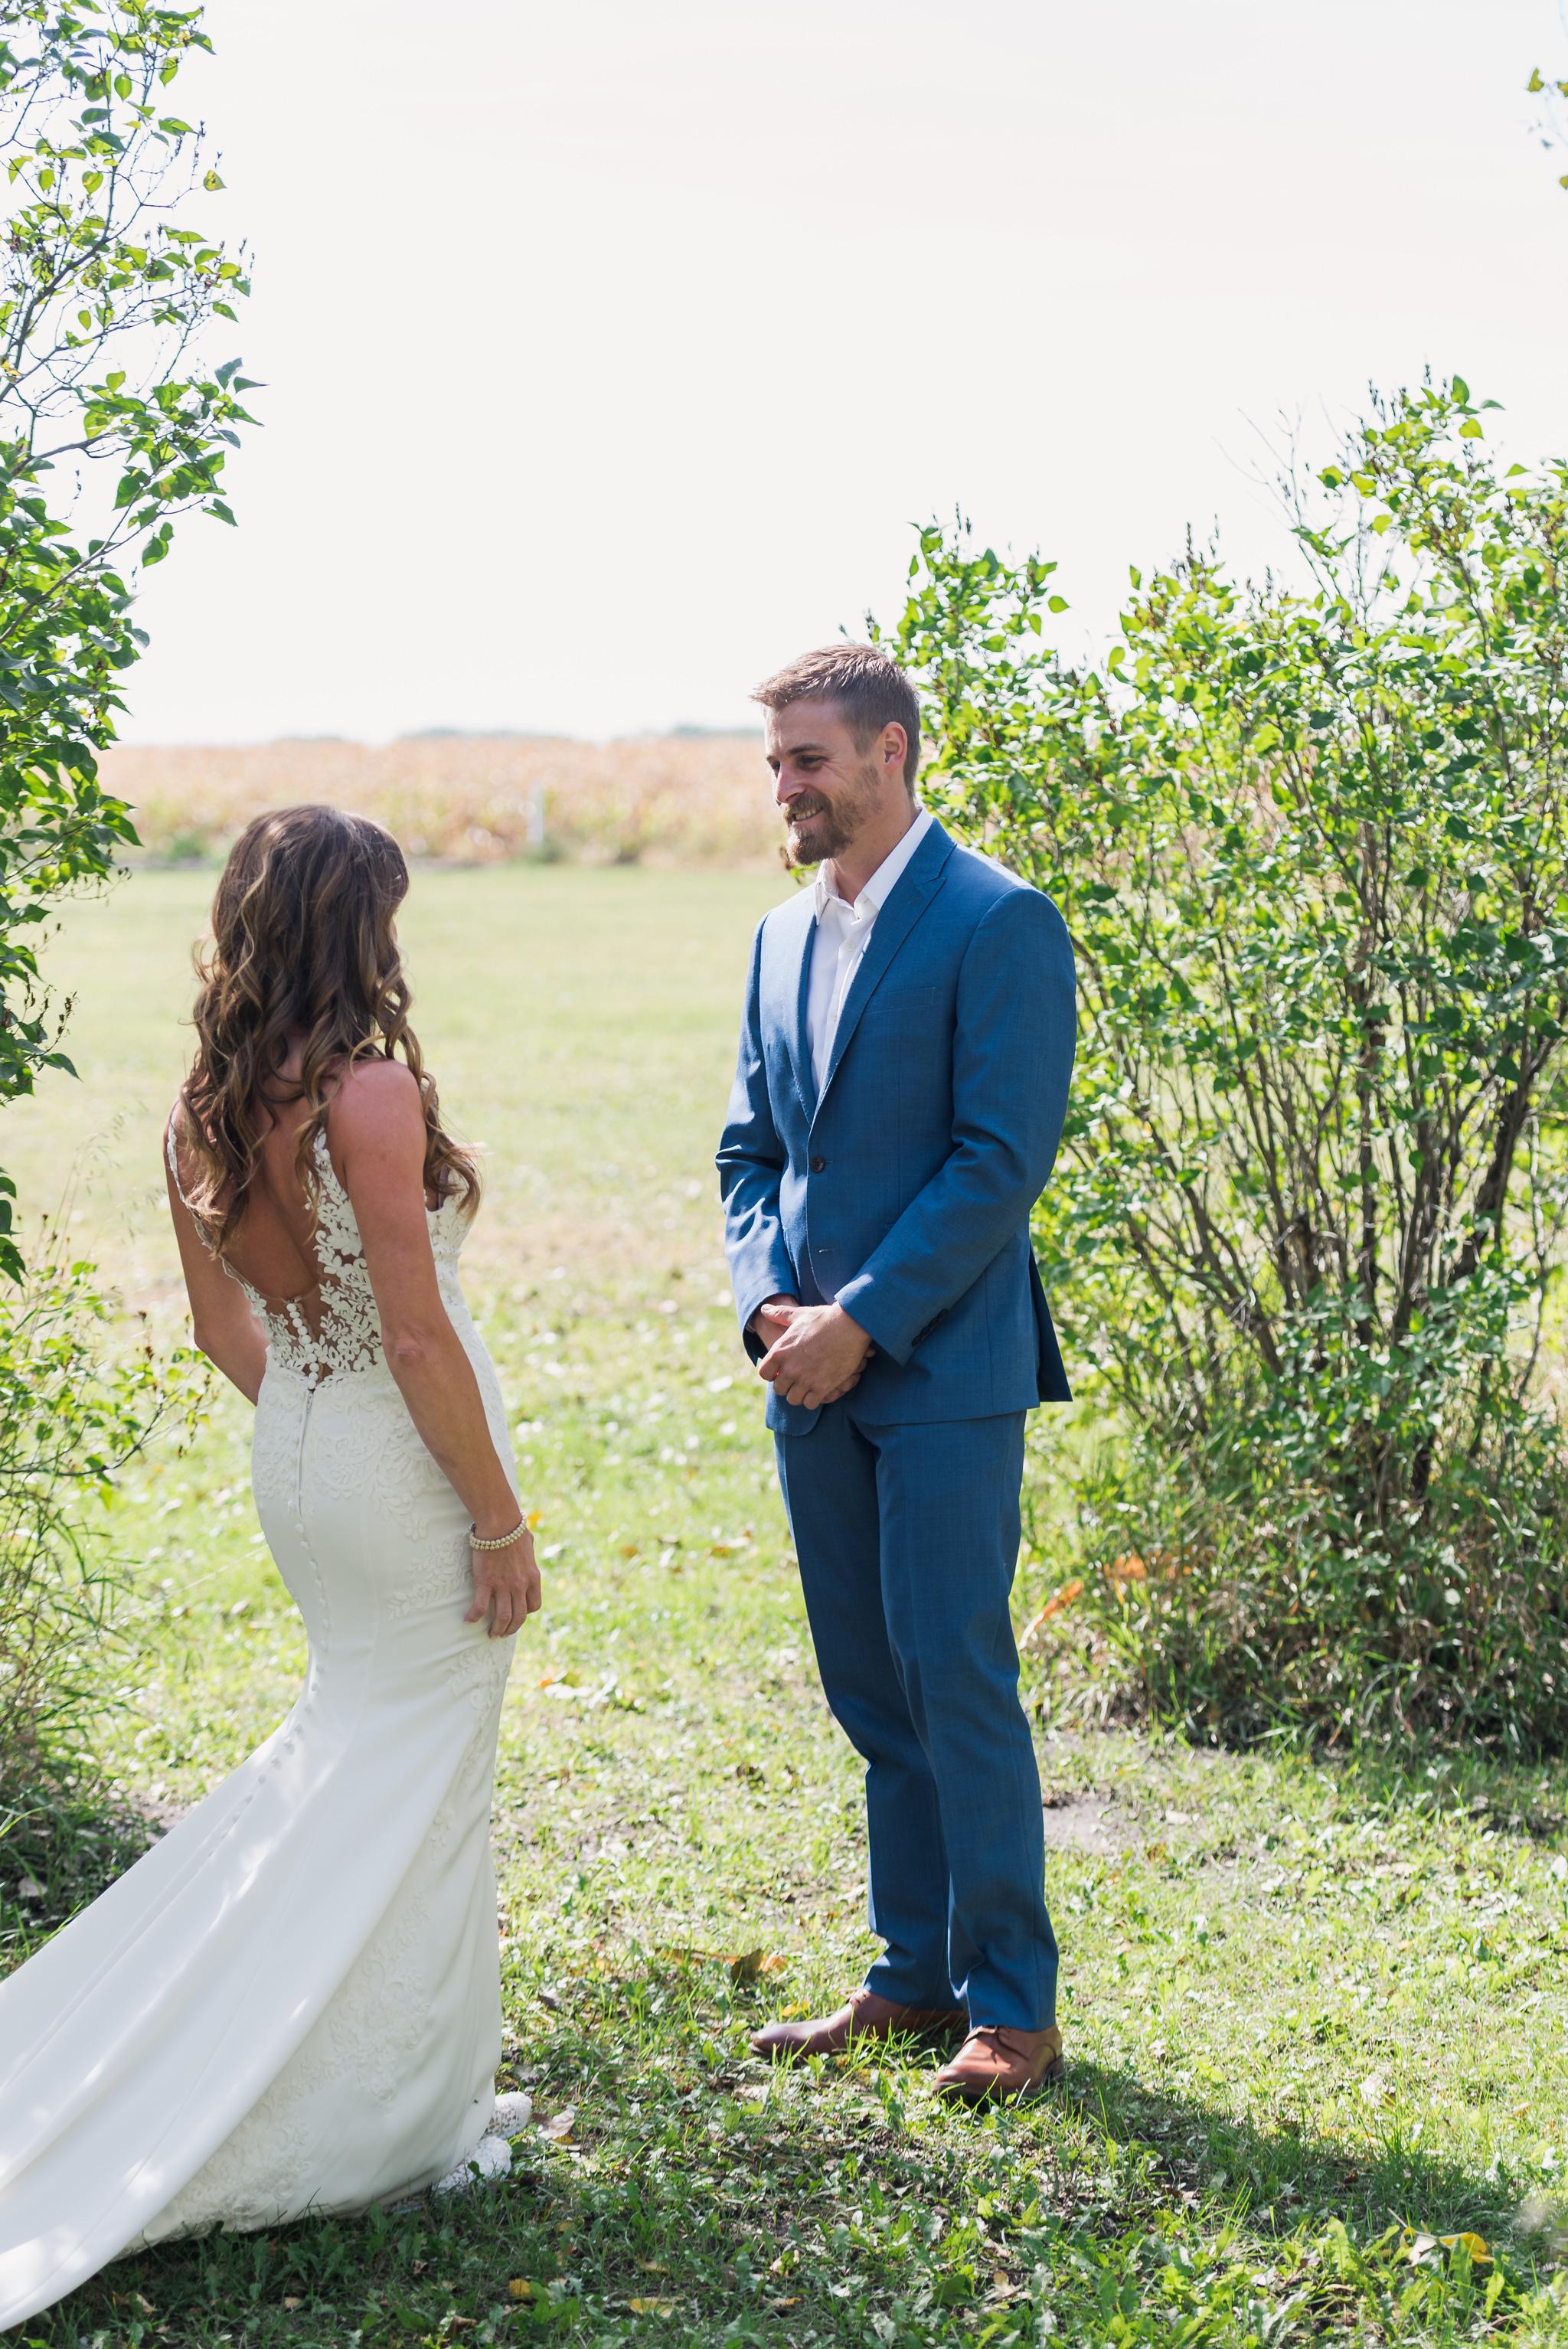 DIY Backyard Wedding | Fargo Wedding Photography by Chelsea Joy Photography